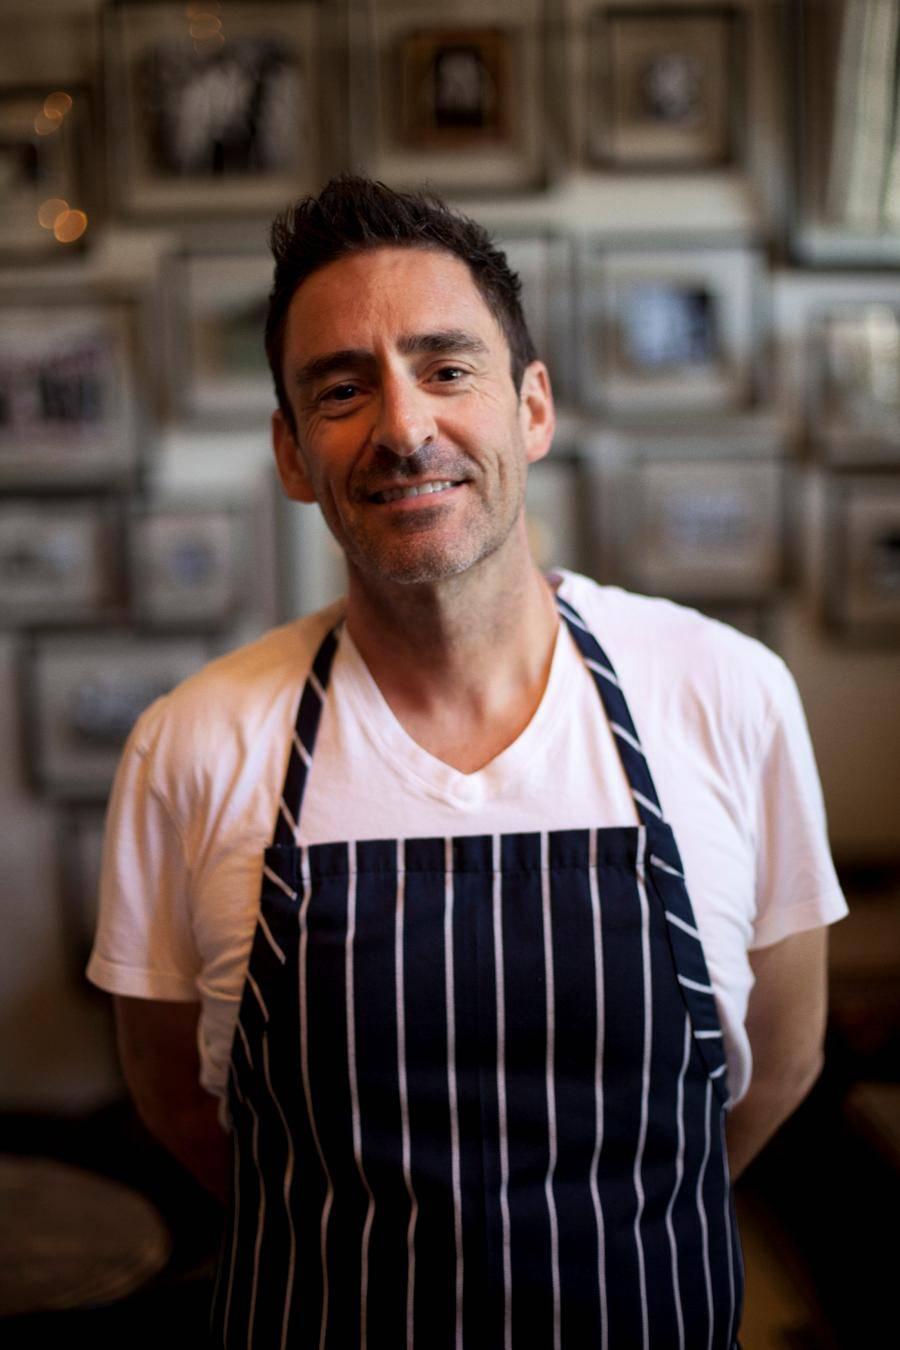 Executive Chef Tim Goodell